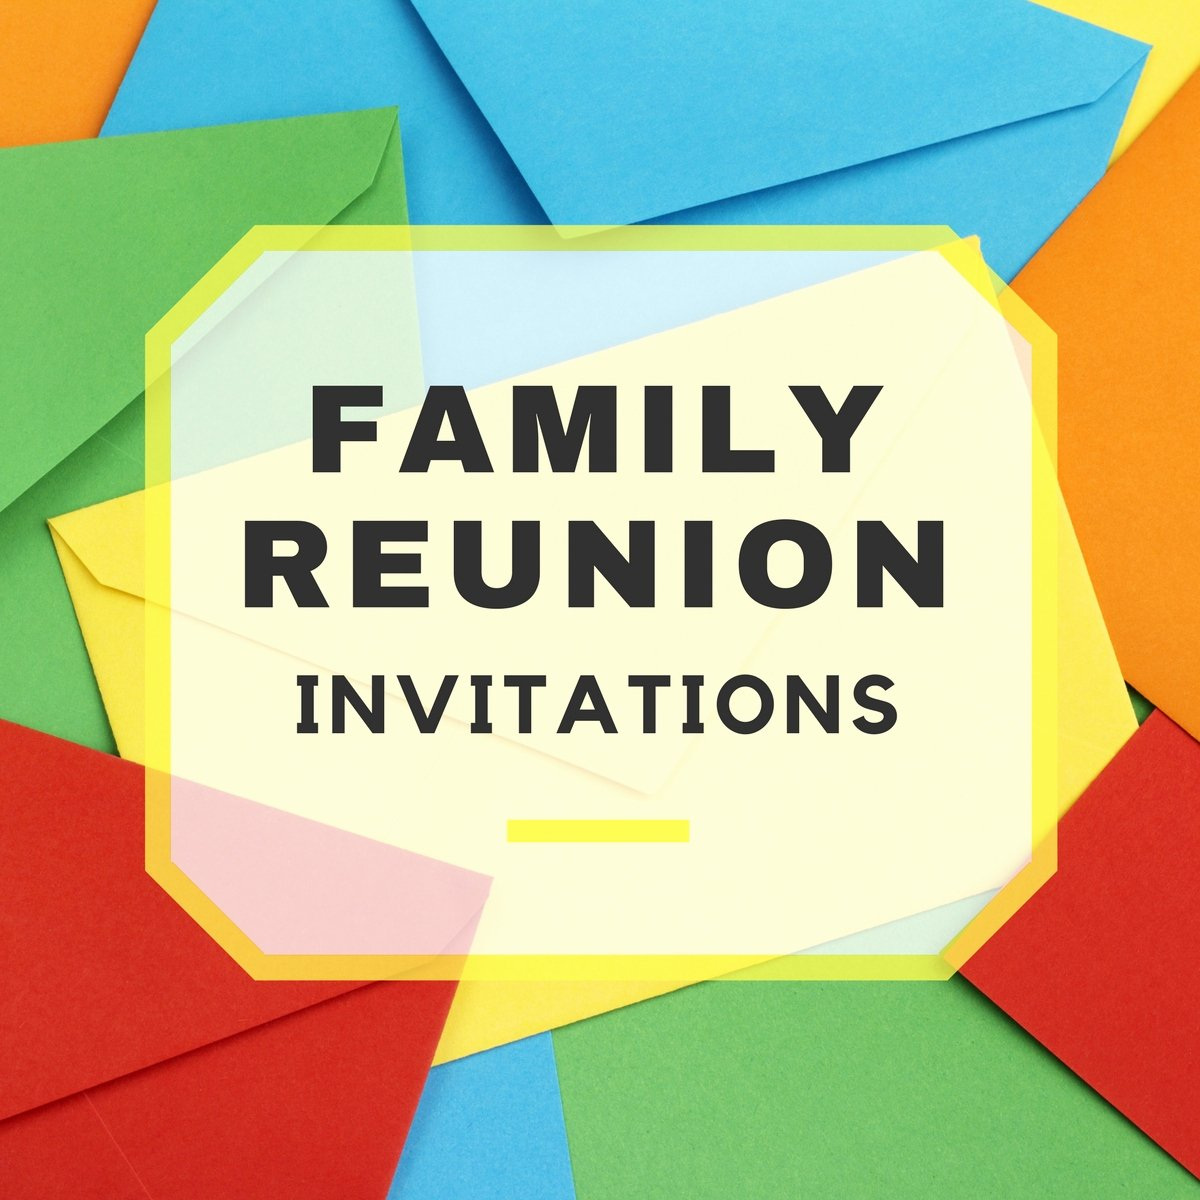 Family Reunion Invitations Templates Fresh Family Reunion Invitations